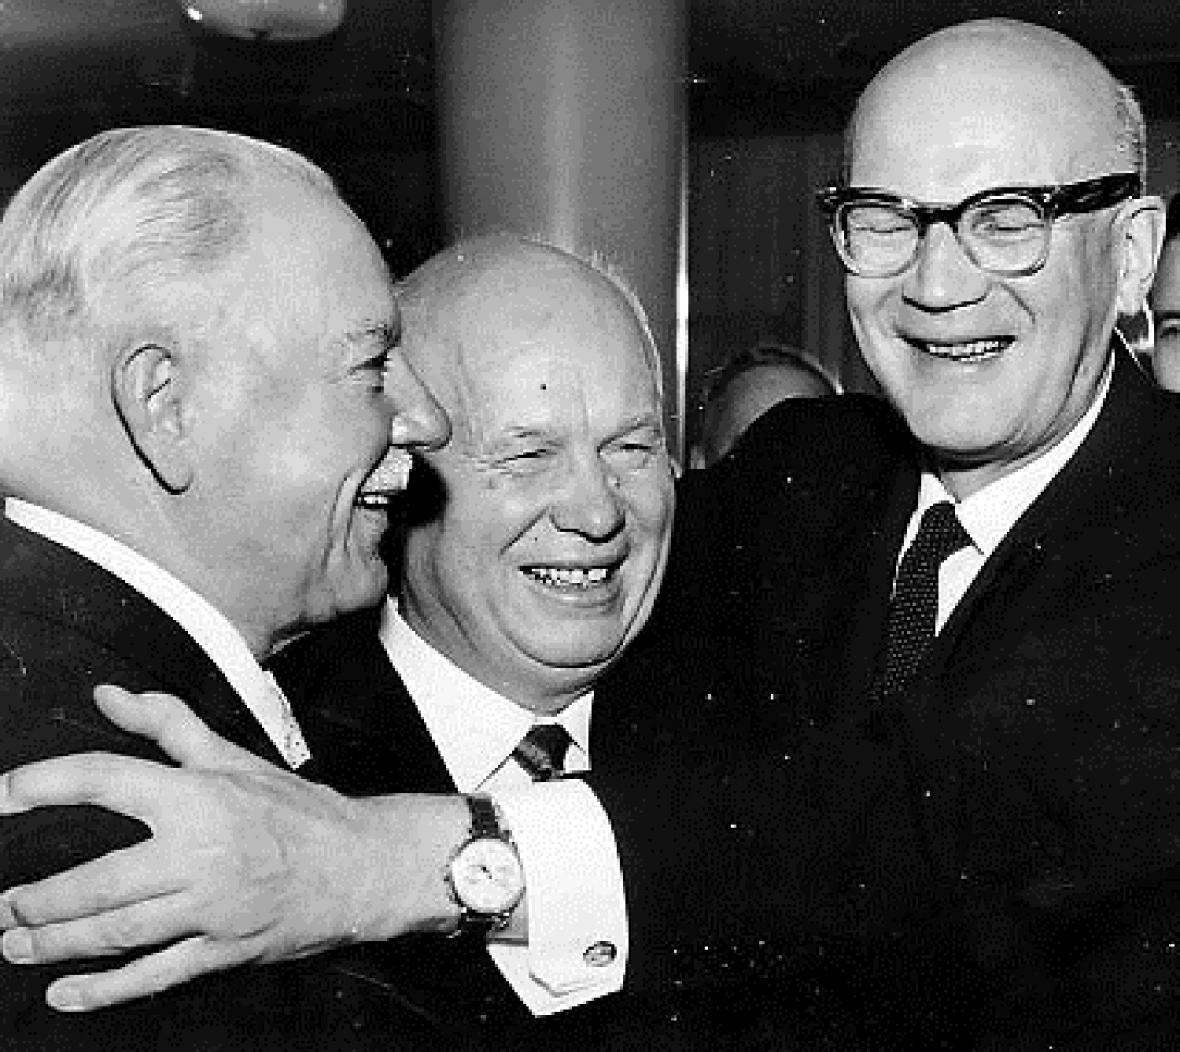 Kliment Vorošilov, Nikita Chruščov a finský prezident Urho Kaleva Kekkonen